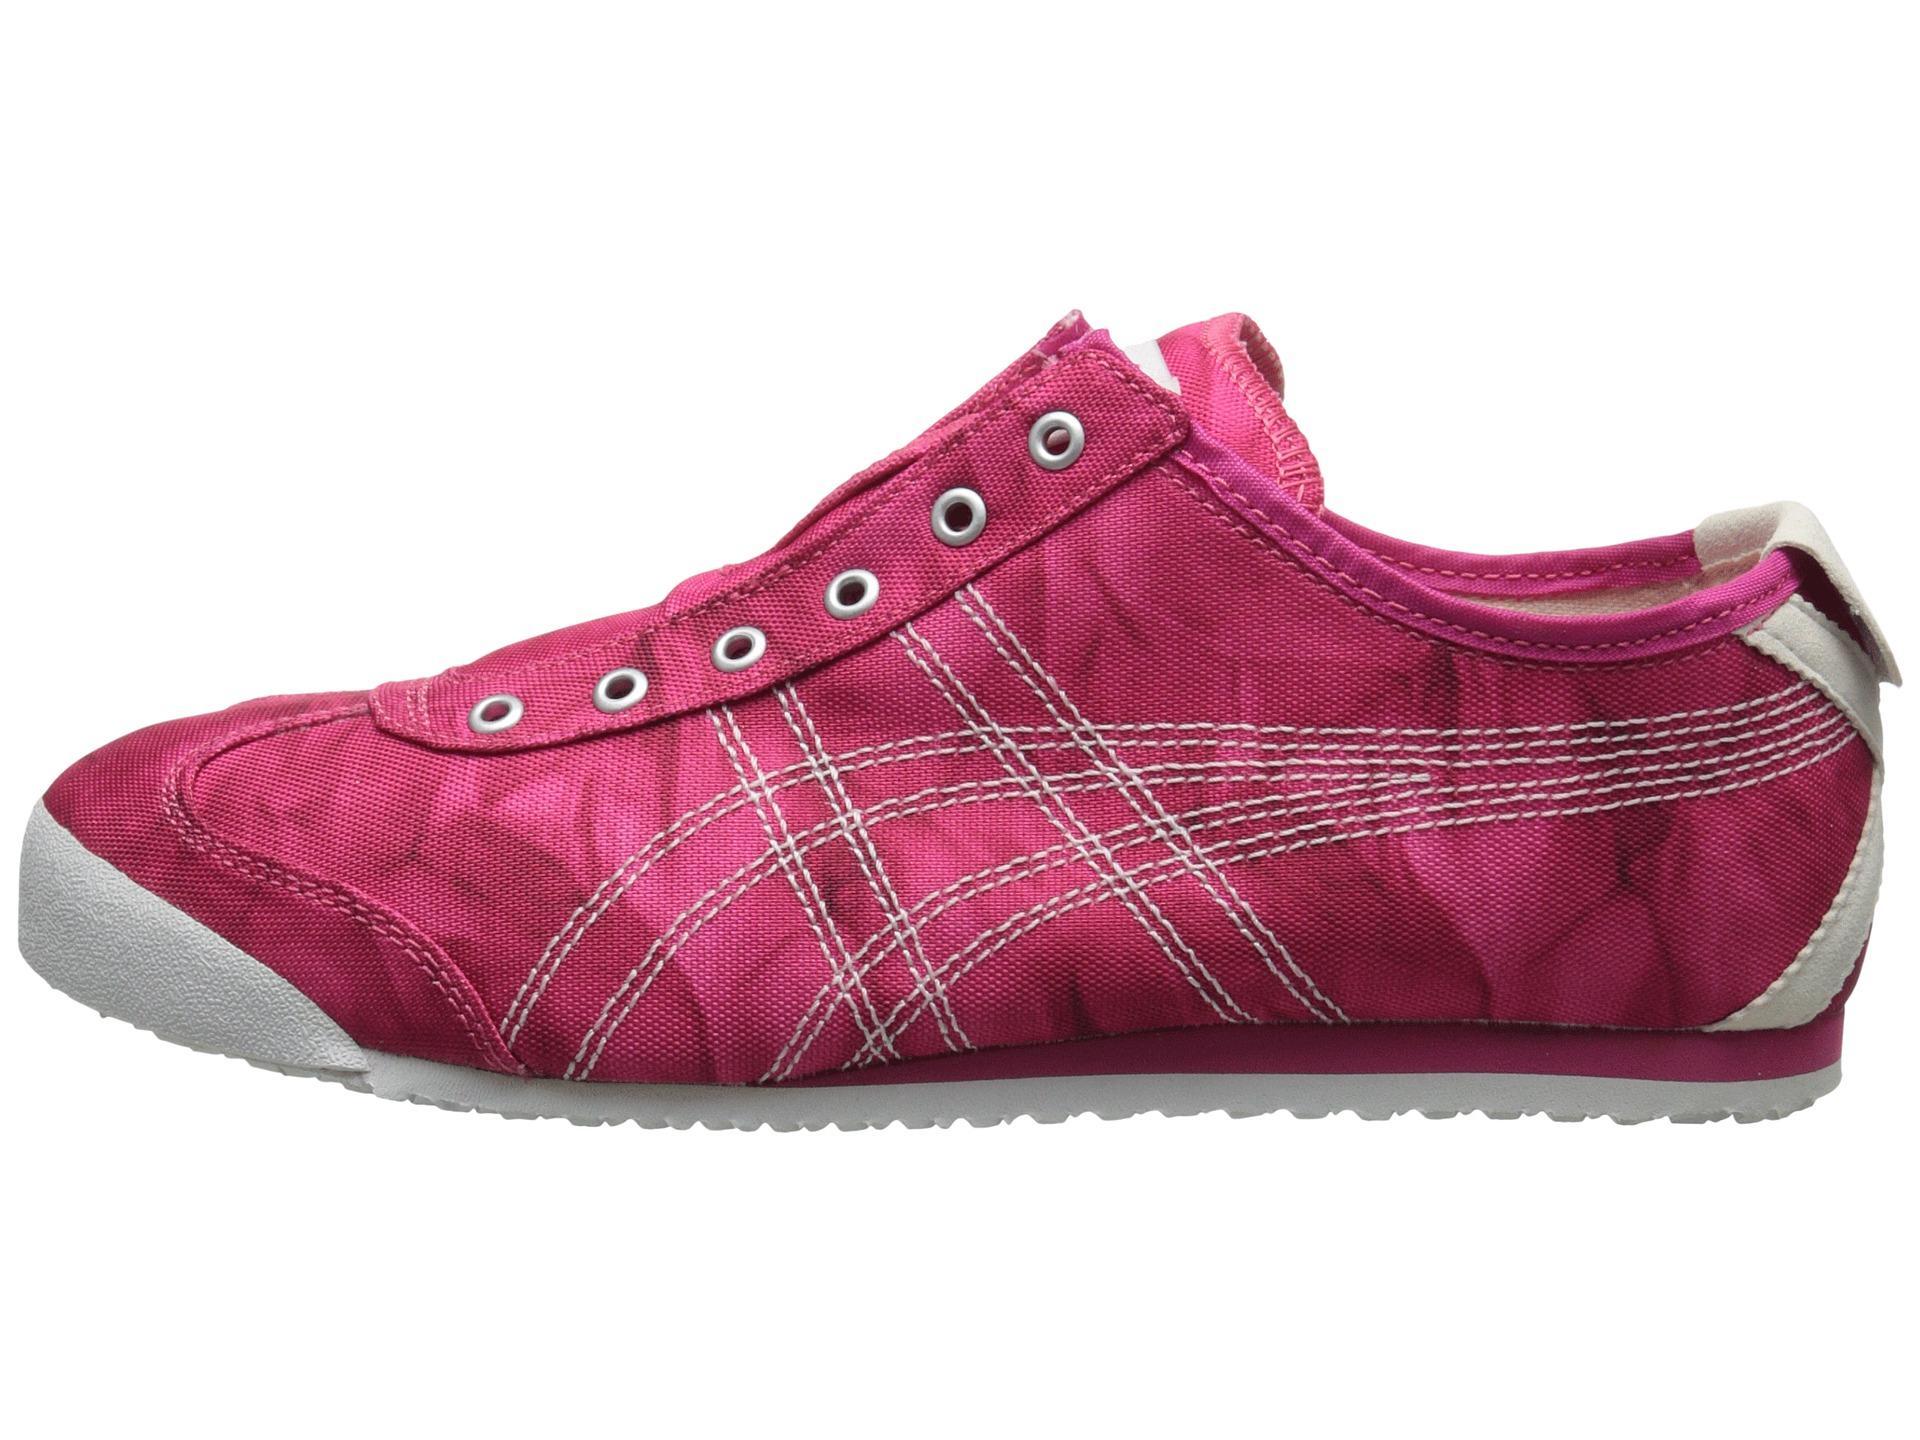 huge selection of e1c29 1ace4 Women's Purple Mexico 66® Slip-on